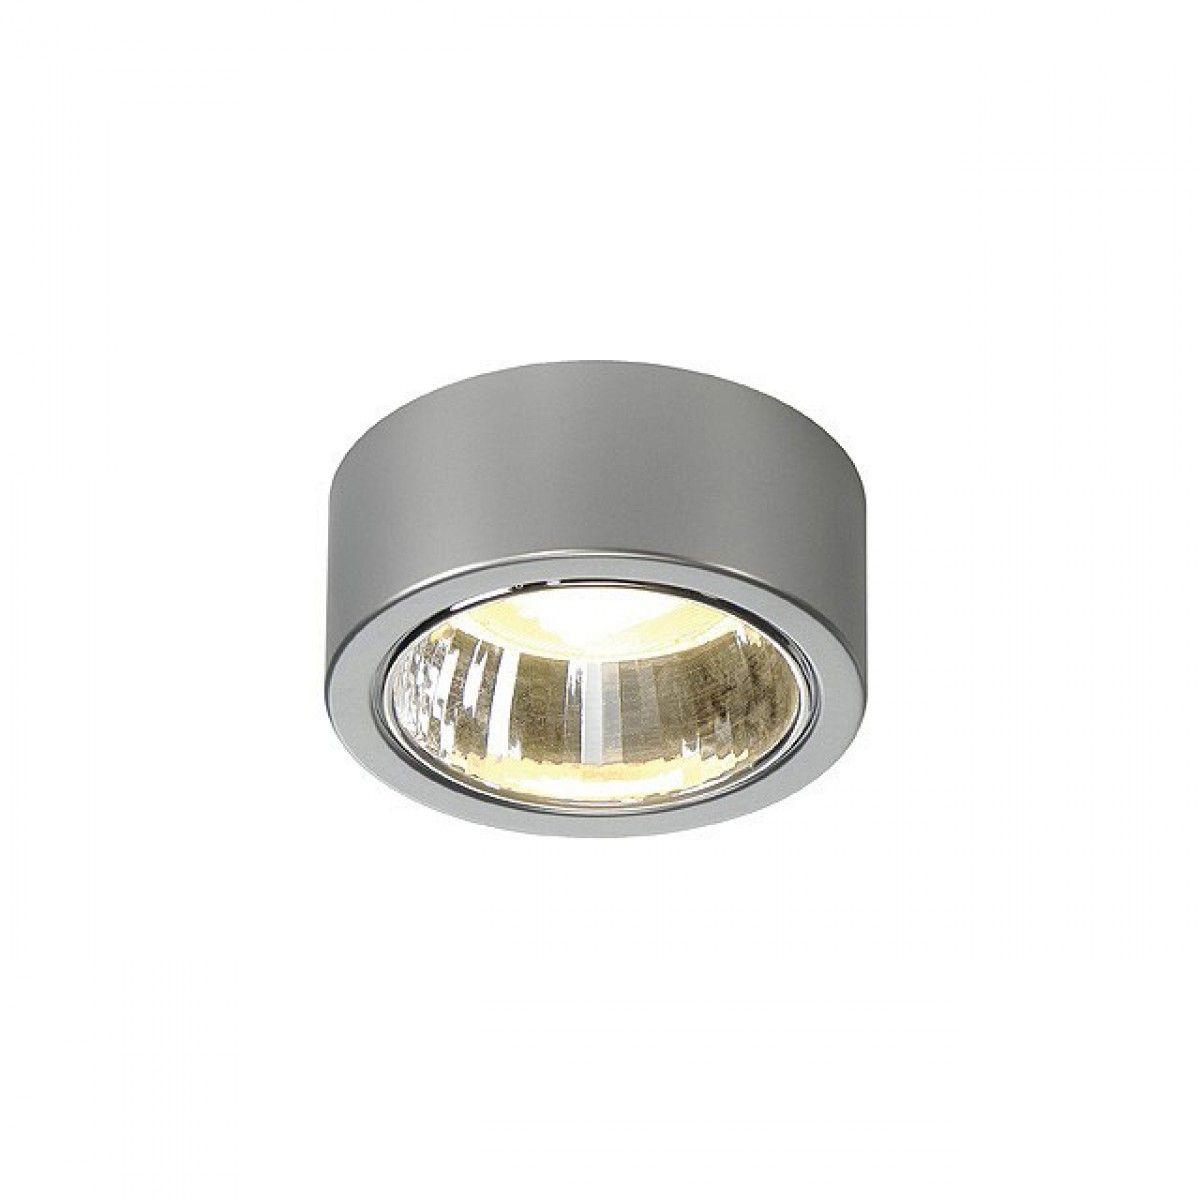 Inbouw en Opbouw Spots - Opbouwspot, CL 101 GX53, rond, zilver ...